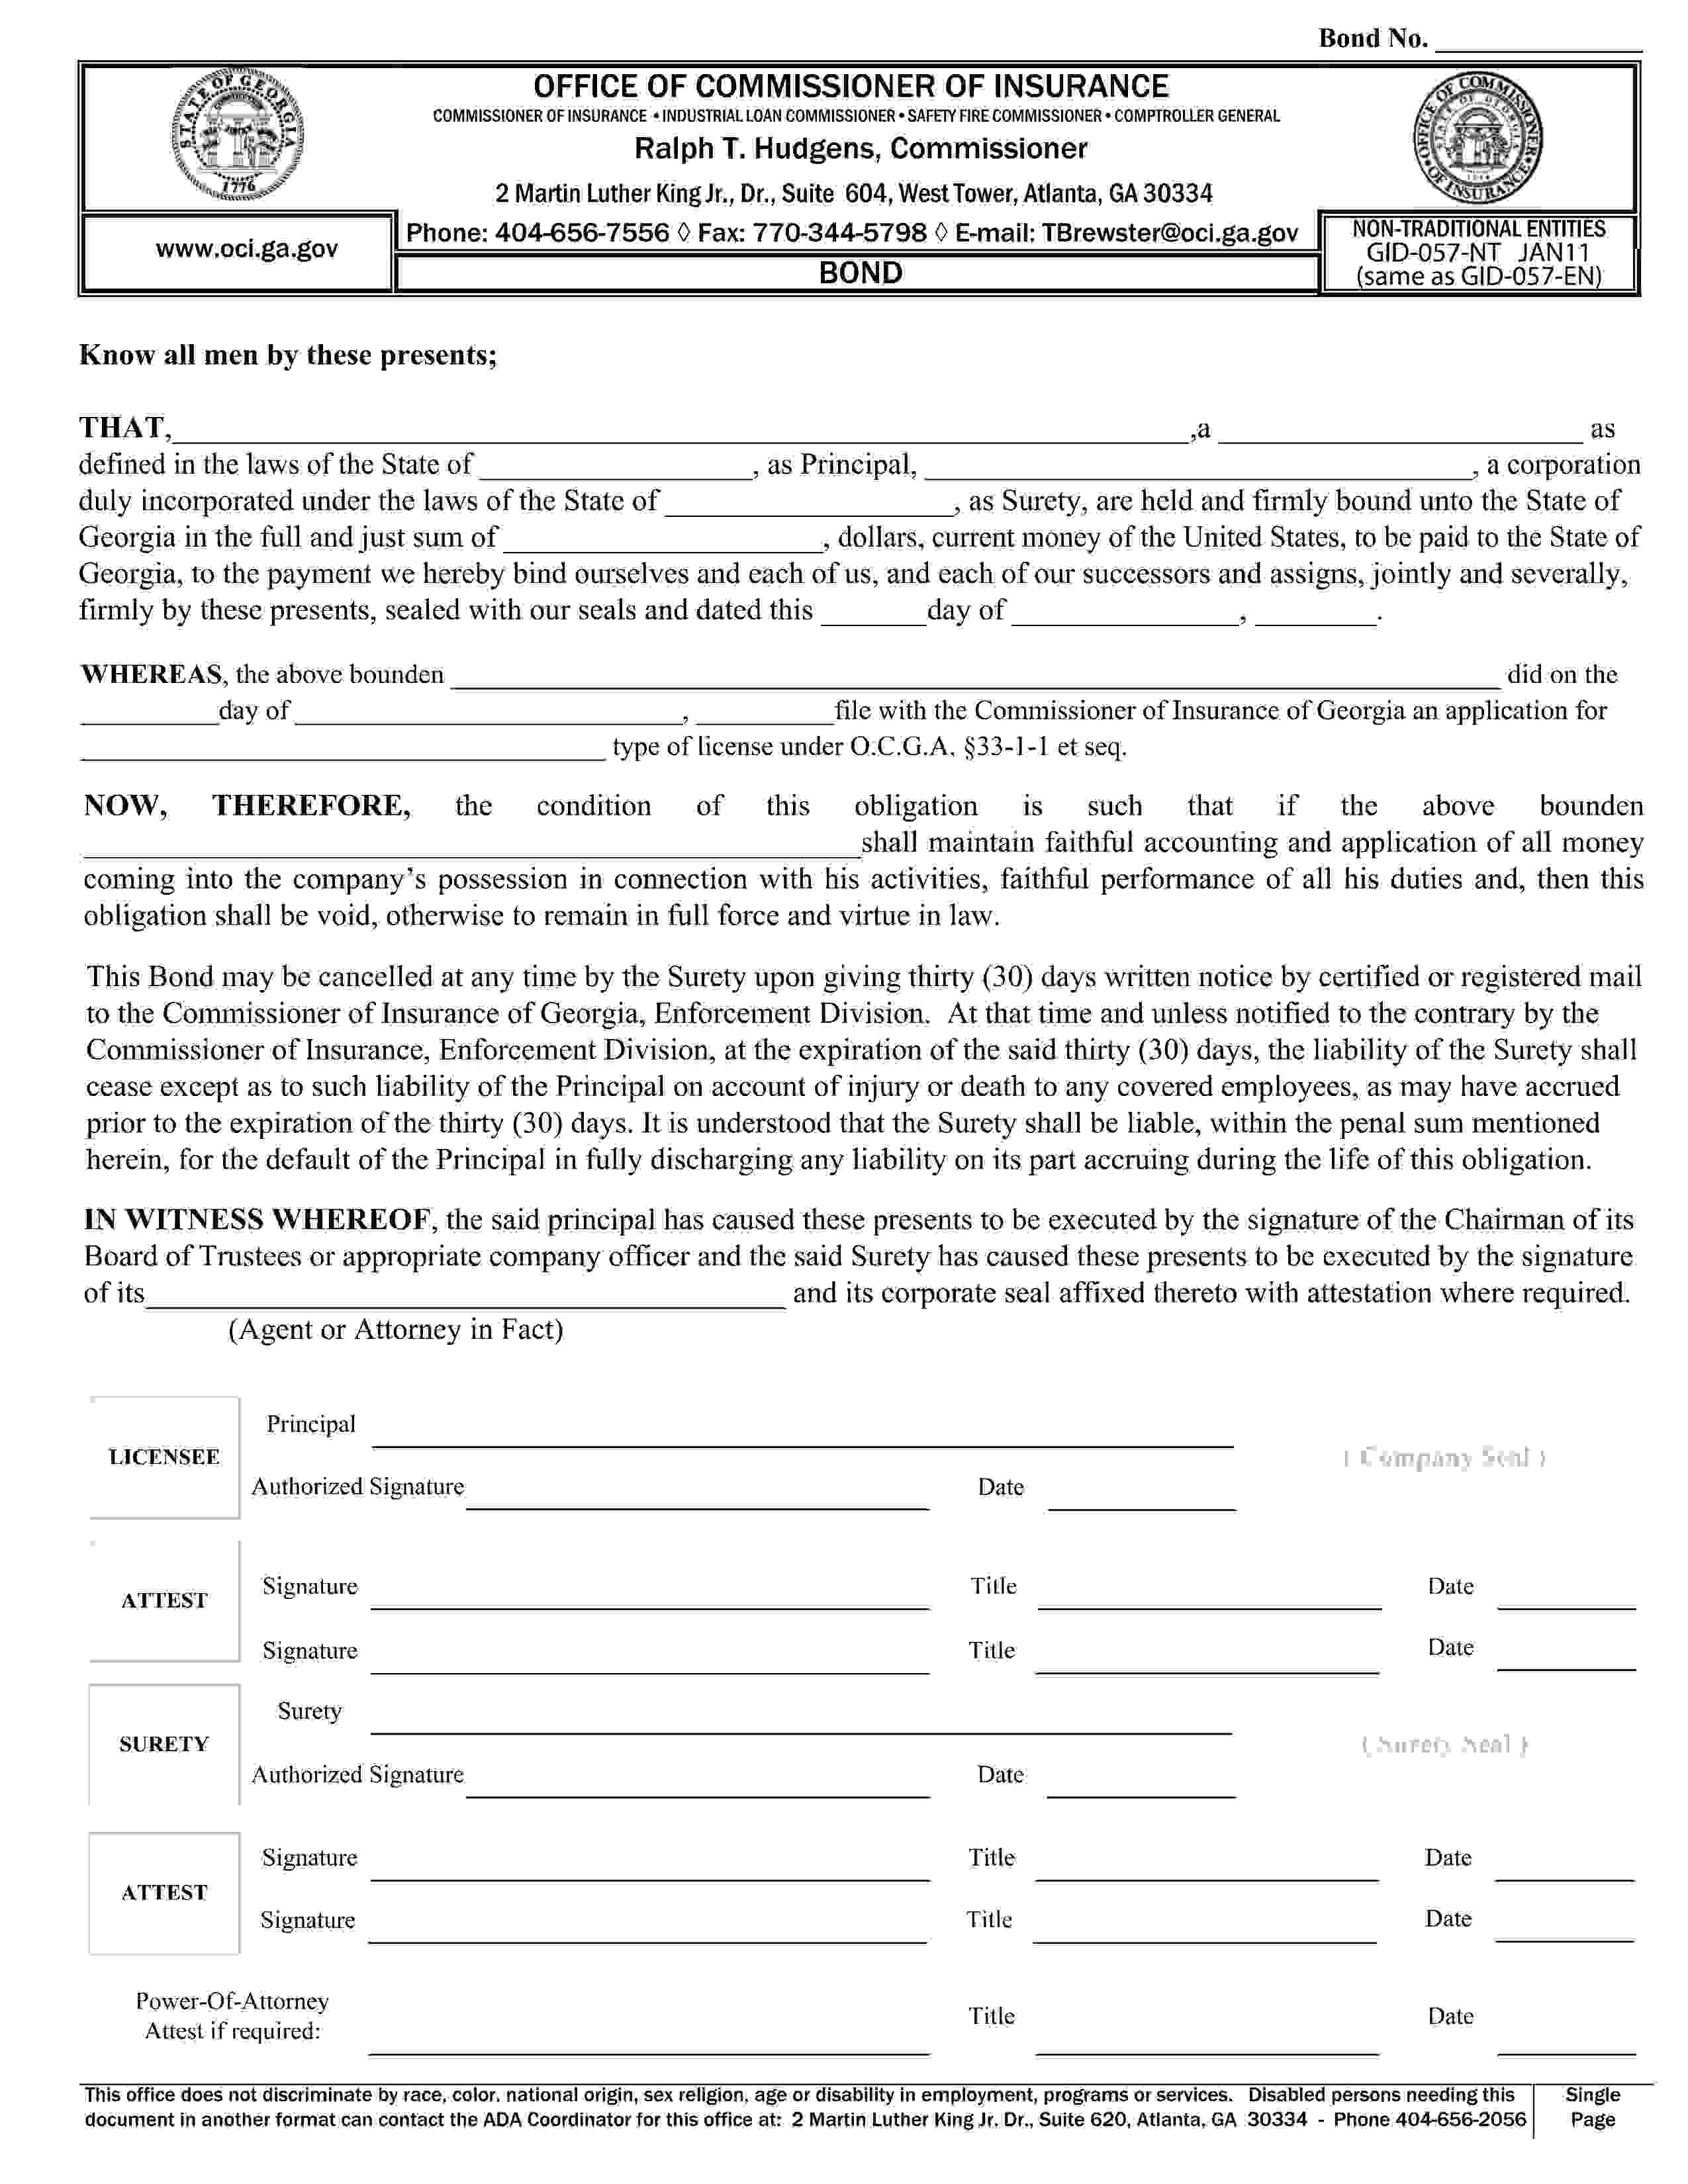 Georgia Commissioner of Insurance Pharmacy Benefits Manager sample image